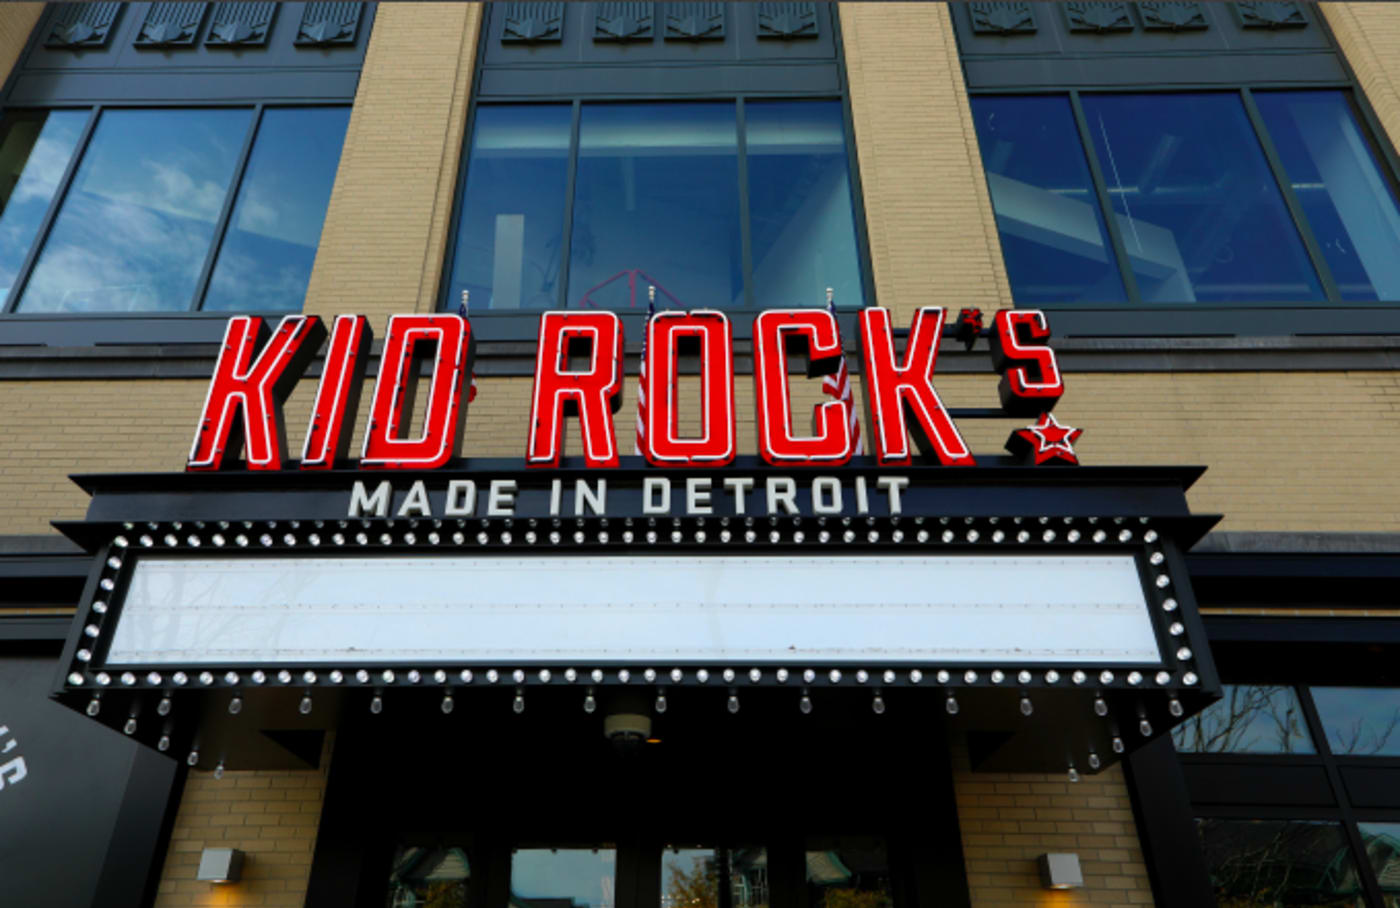 Singer Kid Rock's 'Made In Detroit' restaurant at Little Caesars Arena